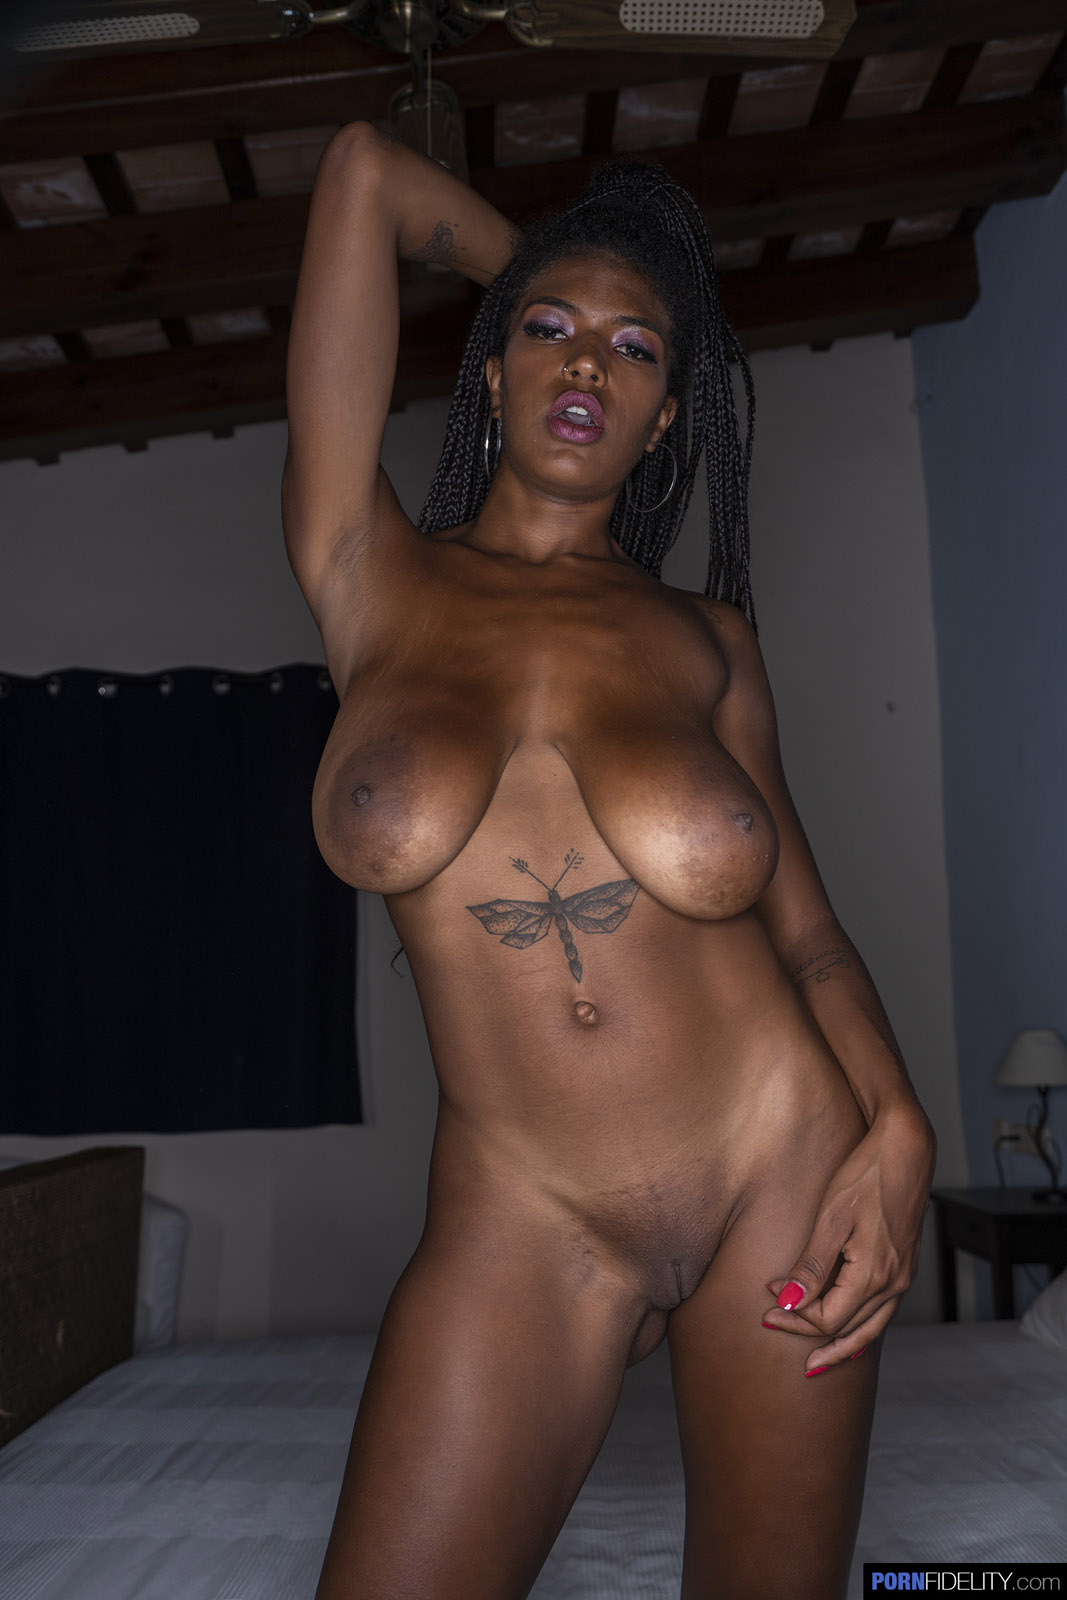 https://cdn.curvyerotic.com/wp-content/uploads/2020/09/tina-fire-shes-on-fire-pornfidelity-9.jpg